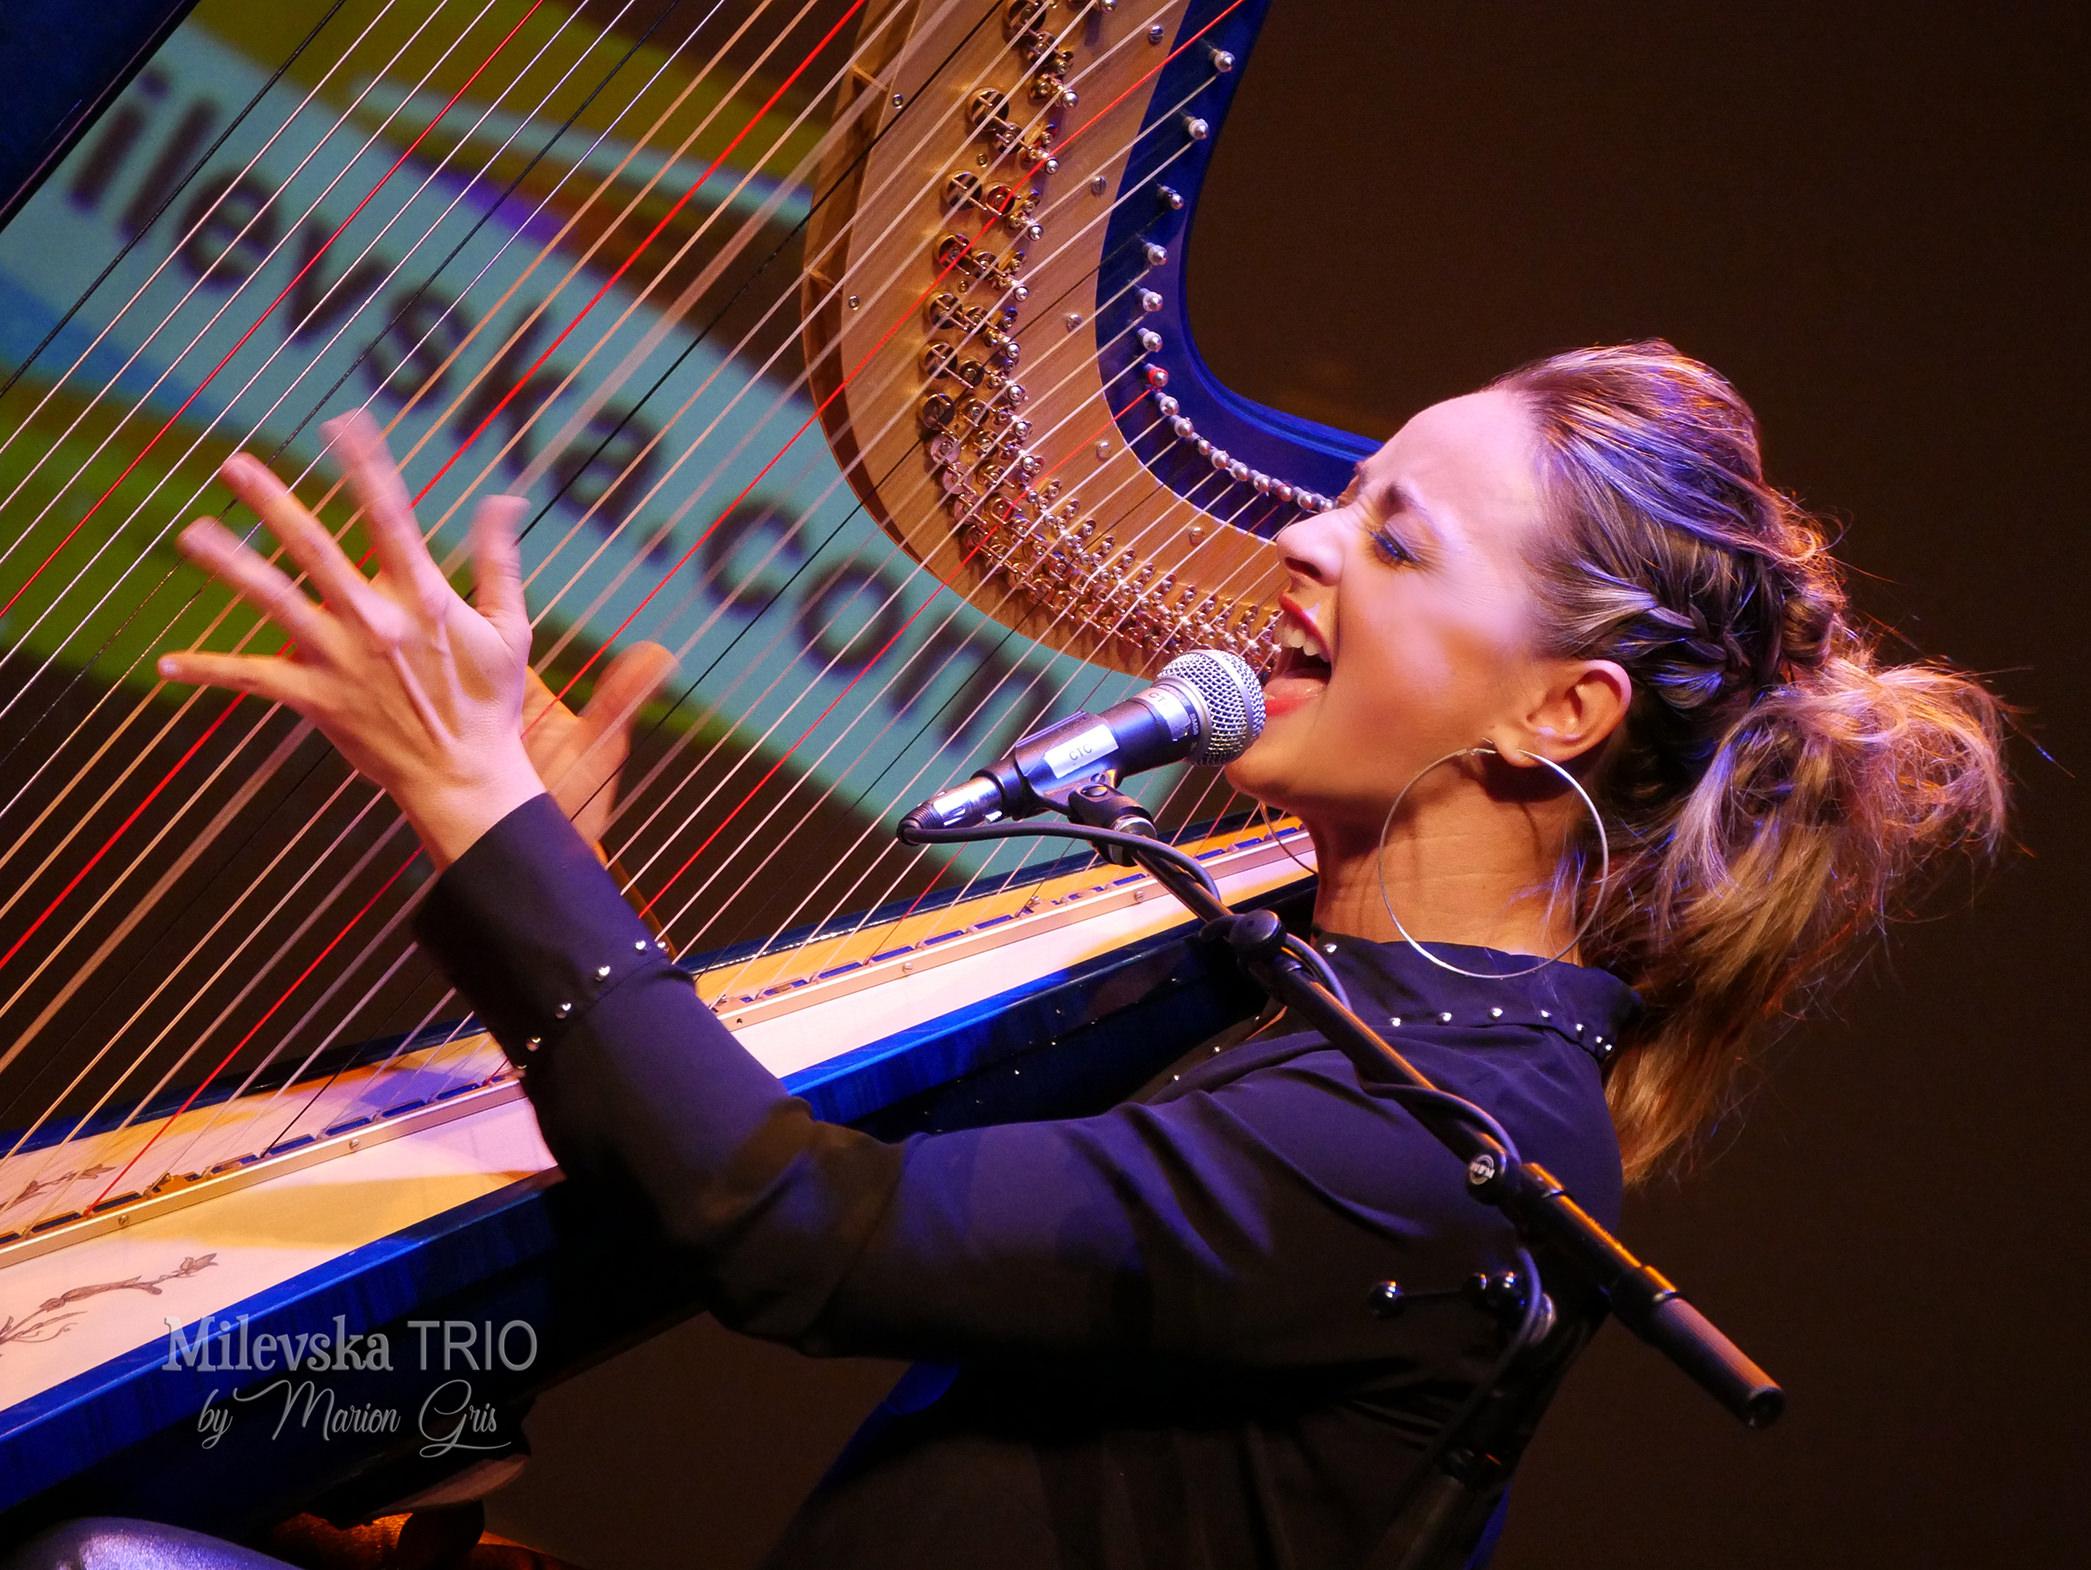 Rossitza Milevska harpiste chanteuse jazz festivals trio